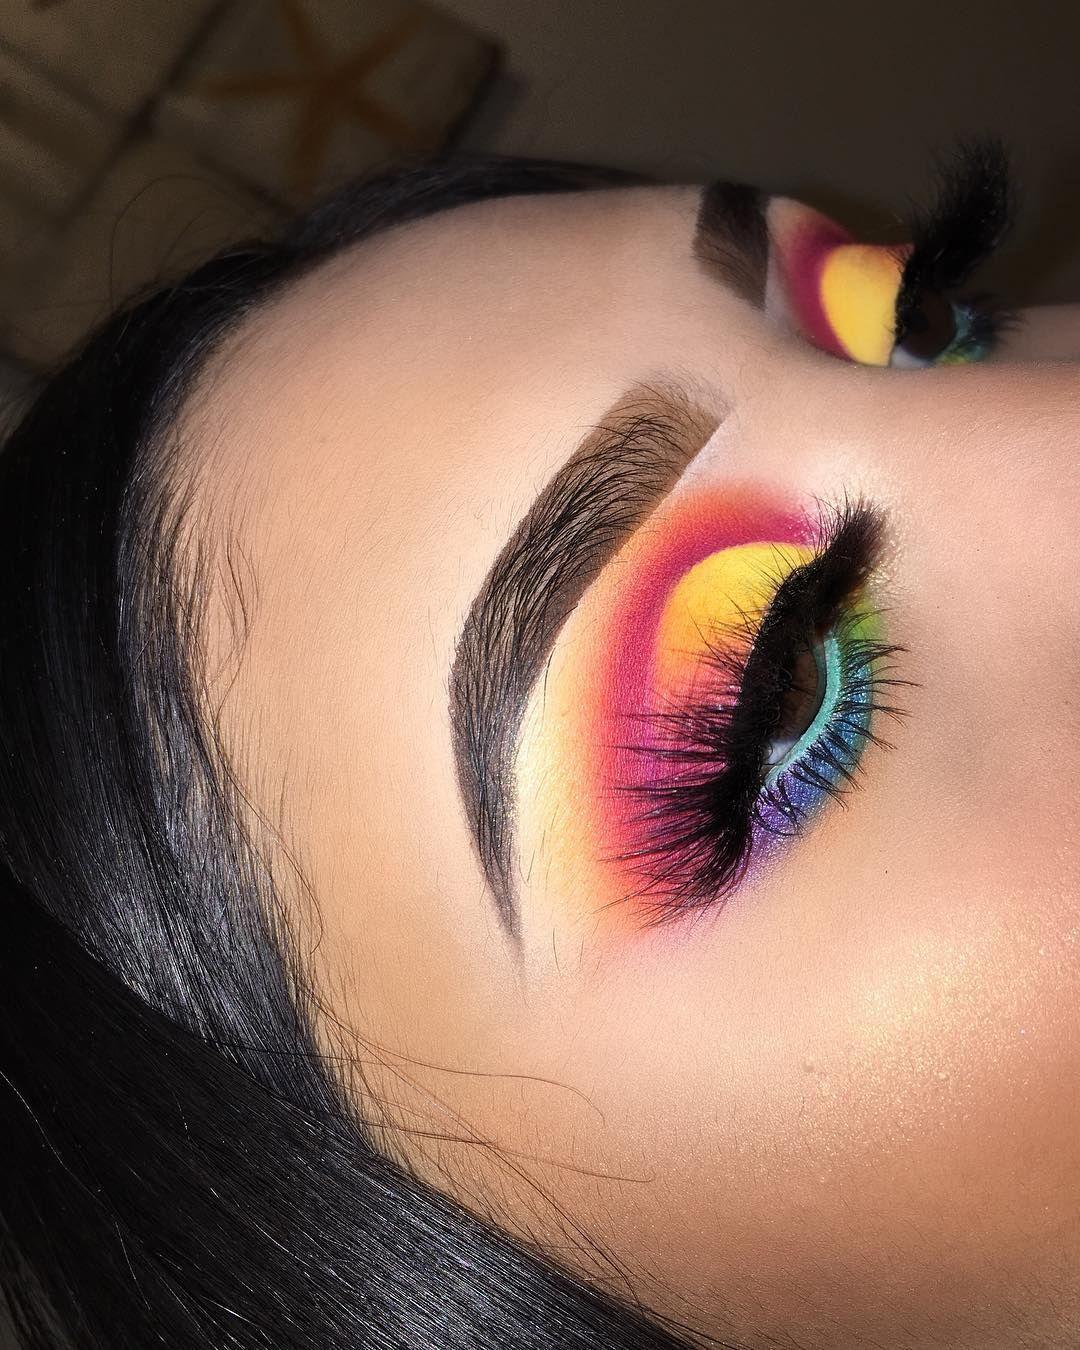 Sarahi On Instagram Colorfull Despues De Muchooooo